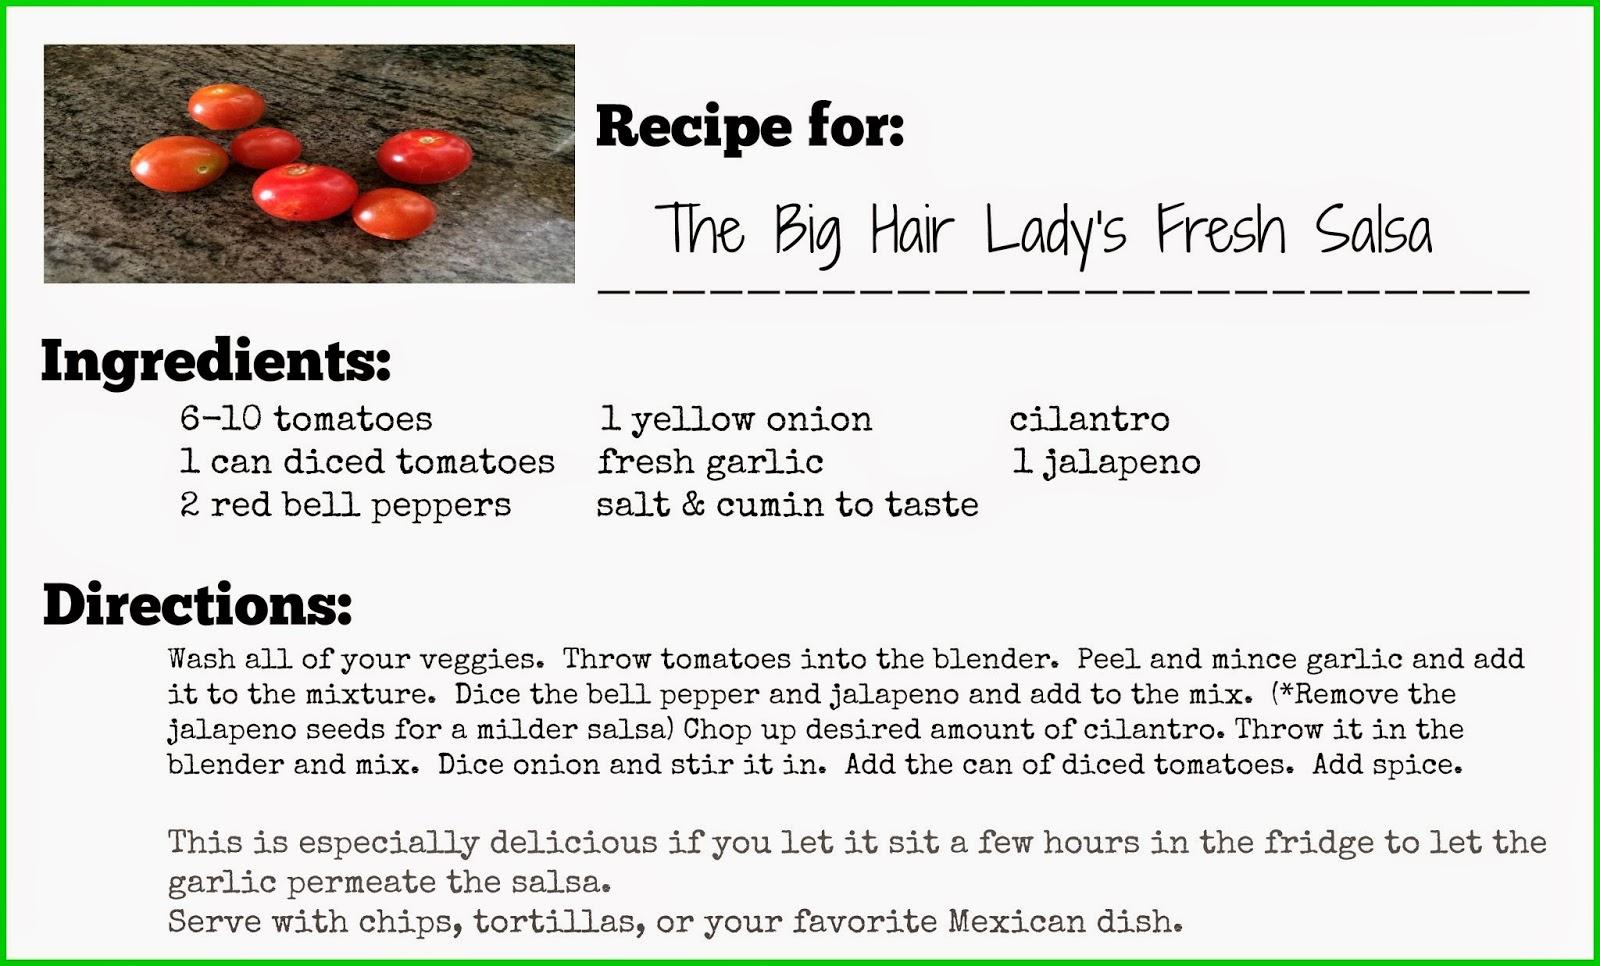 fresh summer salsa recipe card free printable